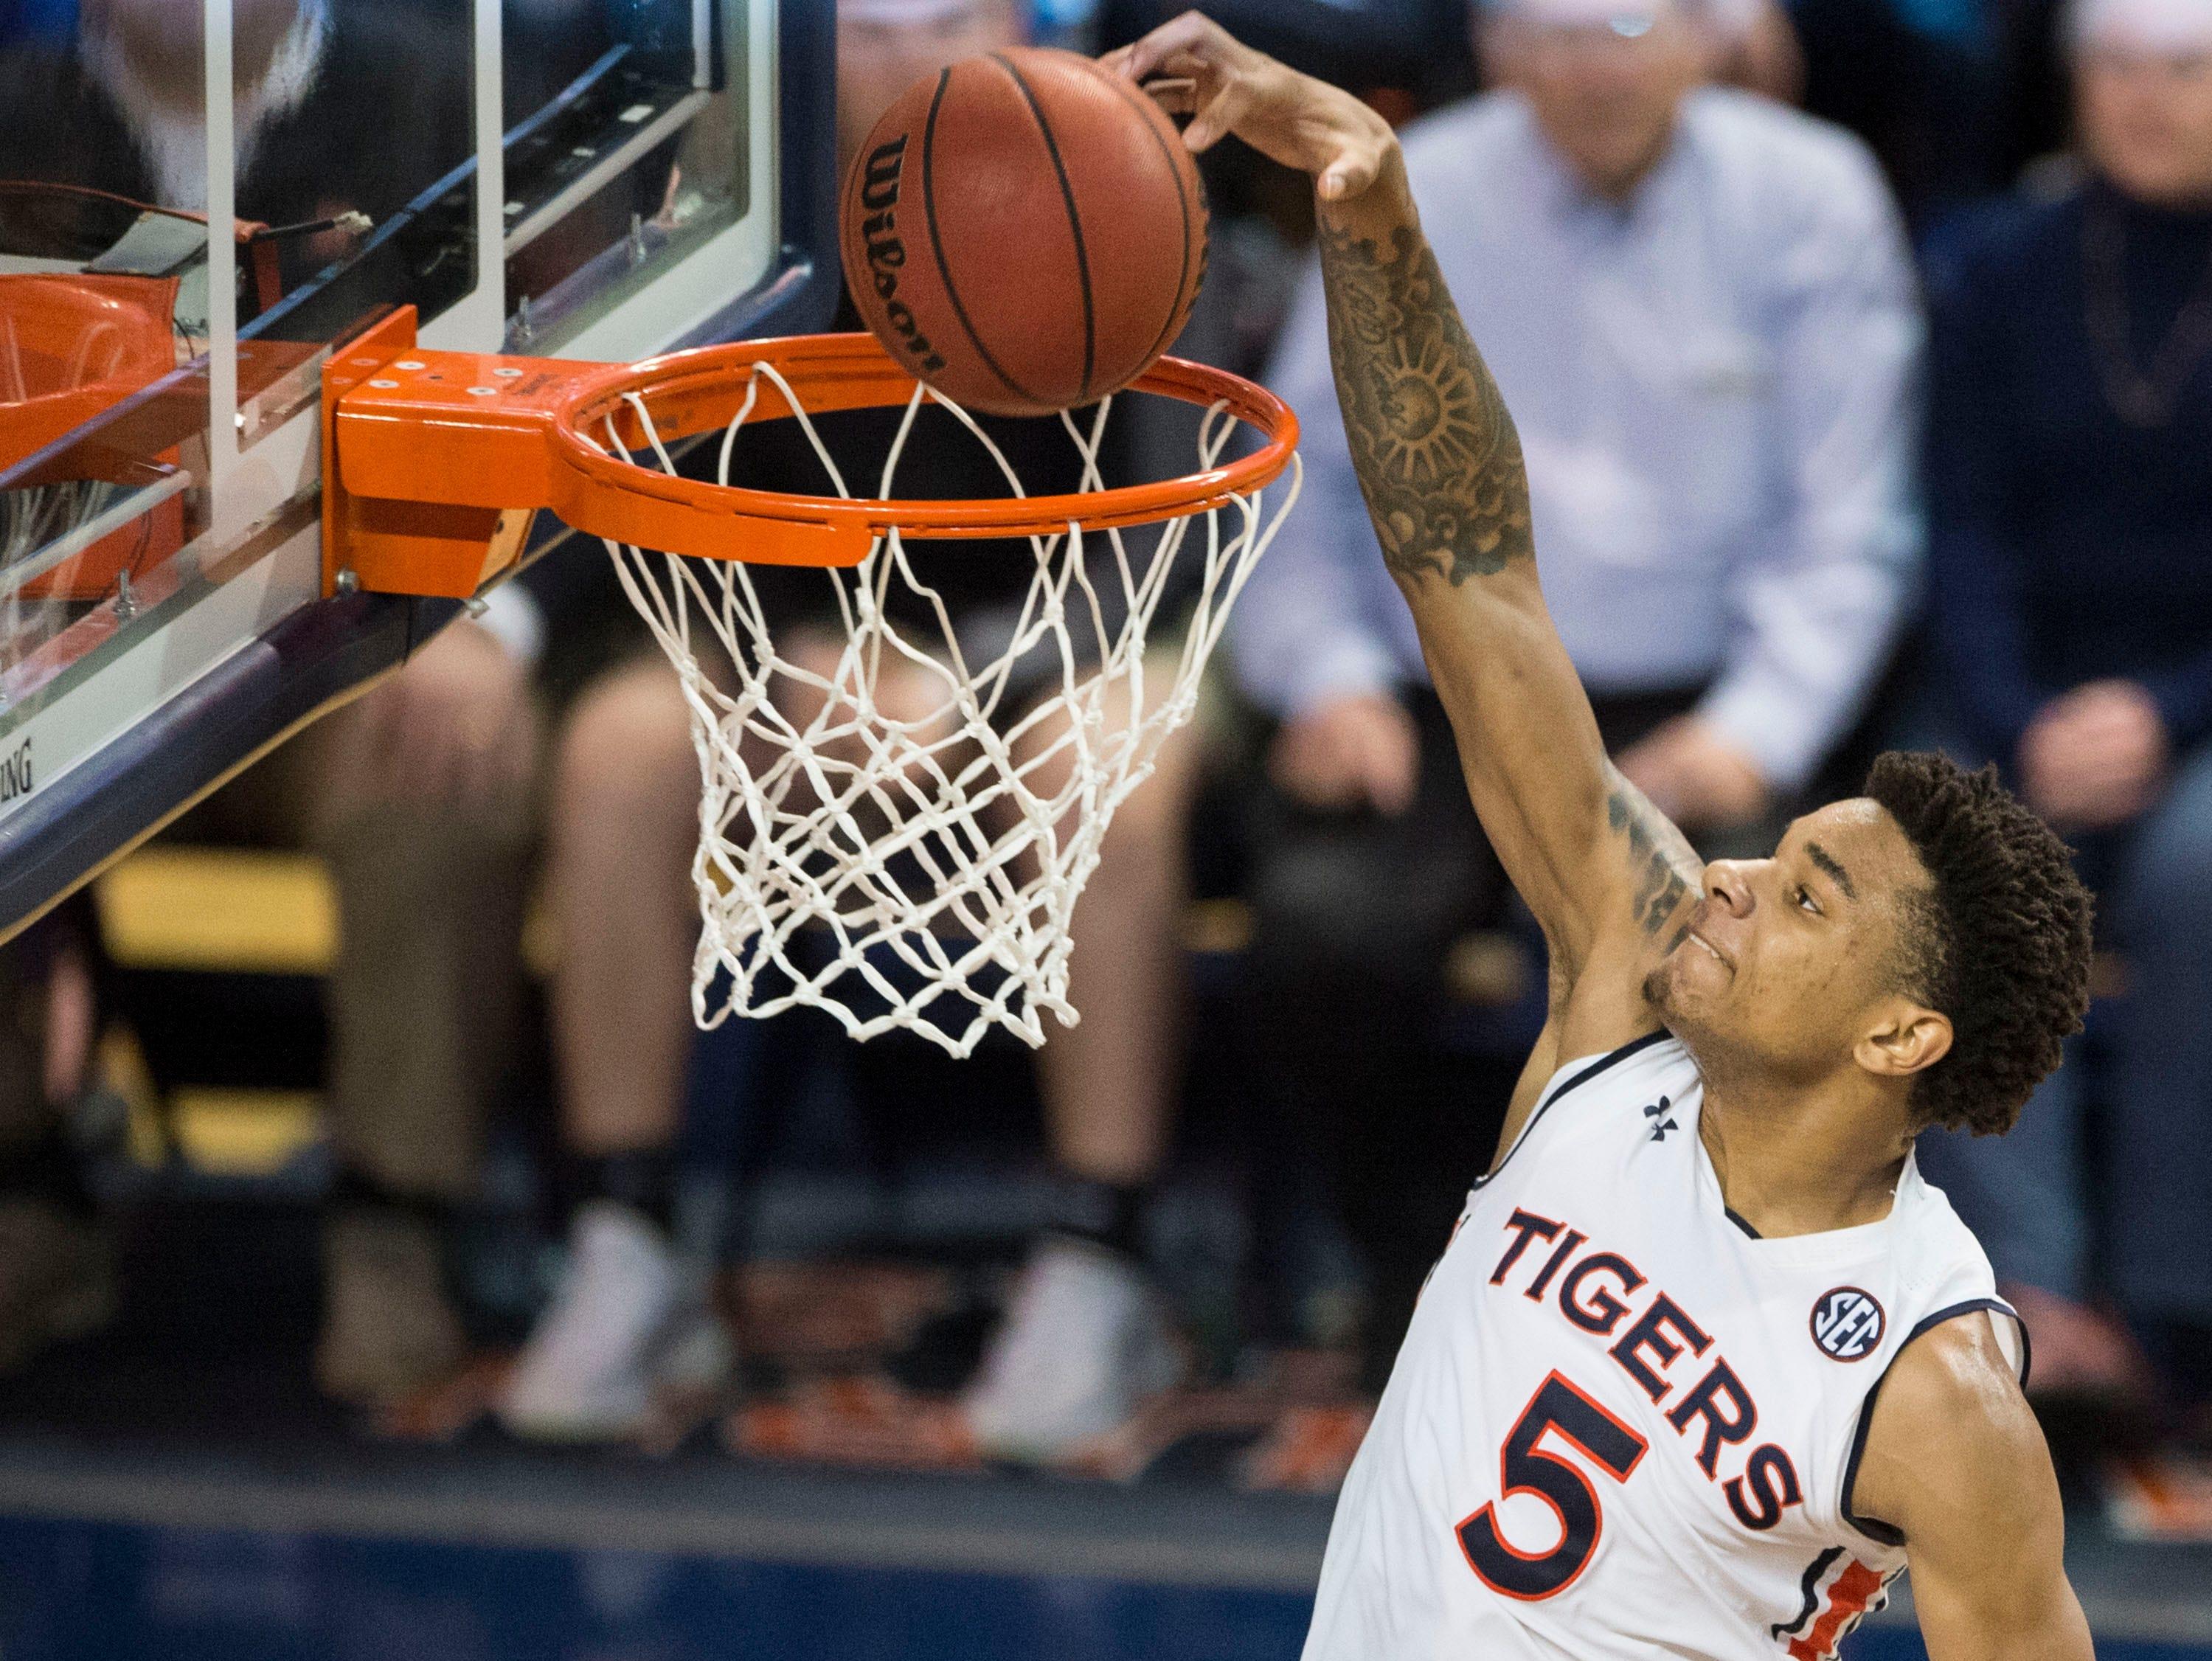 Auburn forward Chuma Okeke (5) dunks the ball at Auburn Arena in Auburn, Ala., on Saturday, March 9, 2019. Auburn defeated Tennessee 84-80.